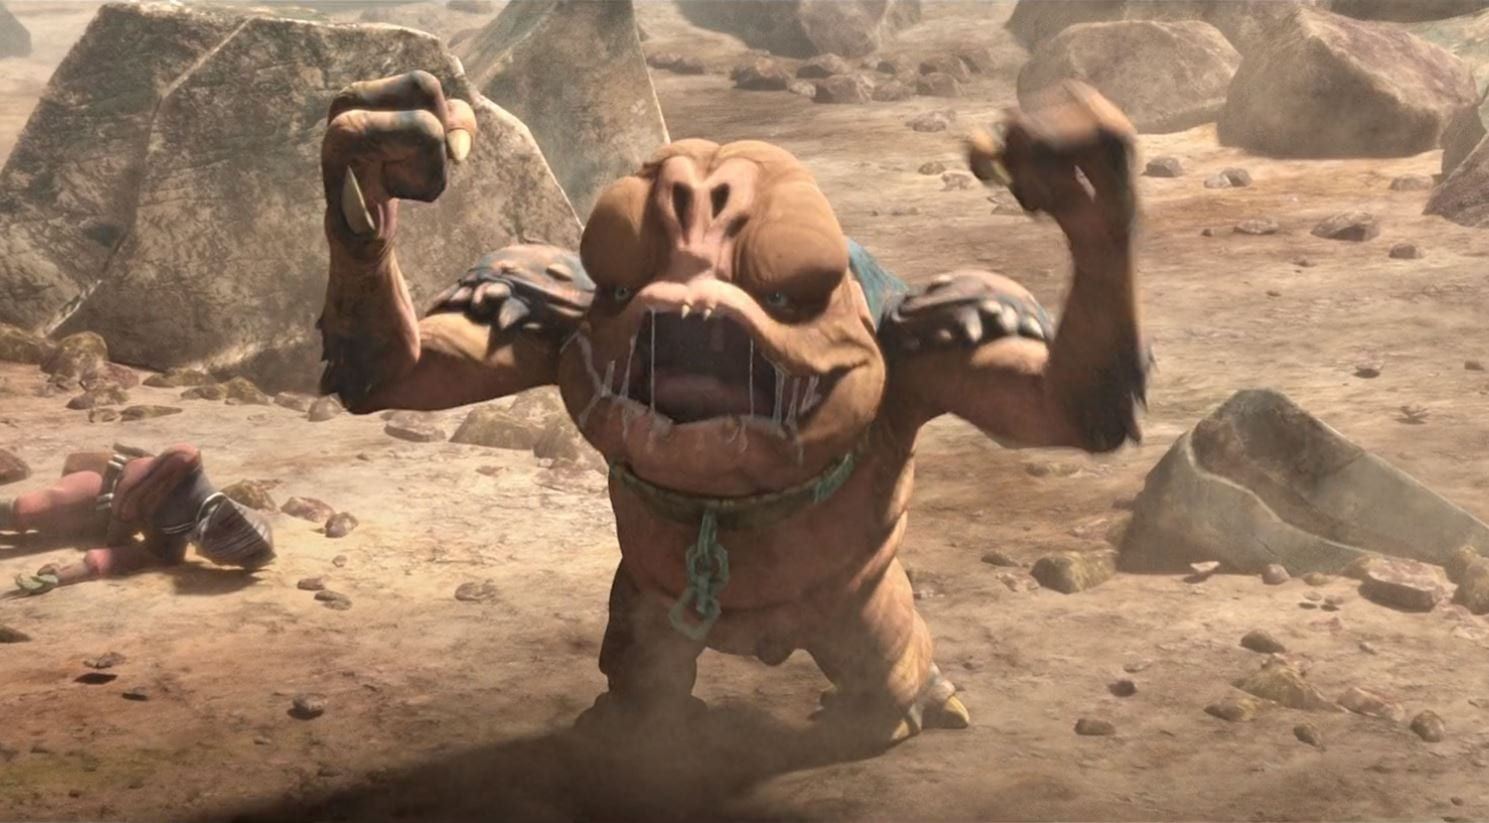 Star Wars: The Bad Batch Episode 5 Ending Explained